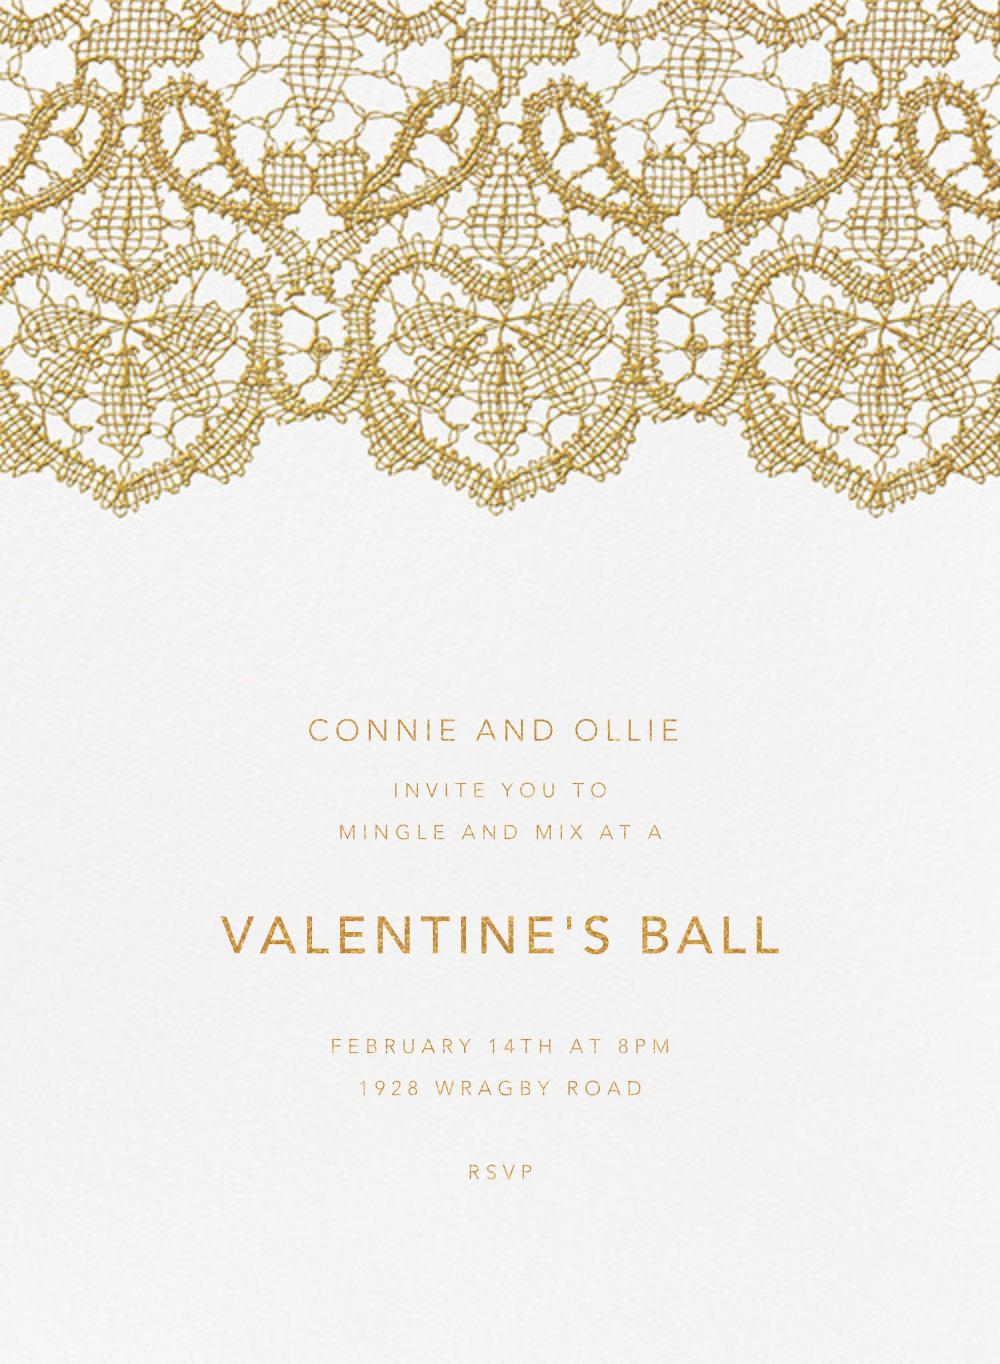 Antique Lace - Medium Gold - Oscar de la Renta - Valentine's Day